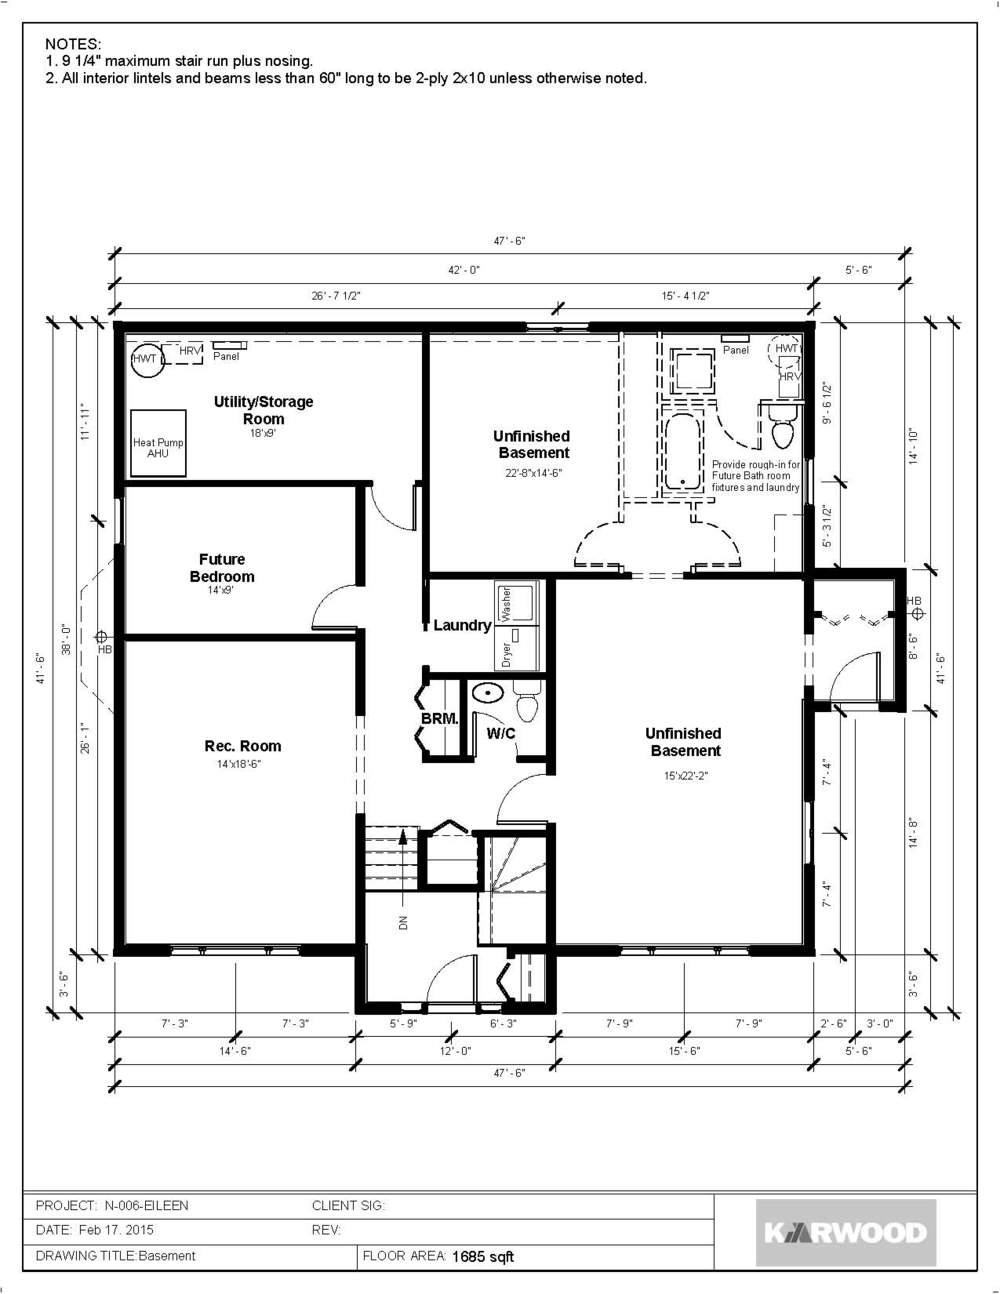 N-006-EILEEN (listing) 2.jpg